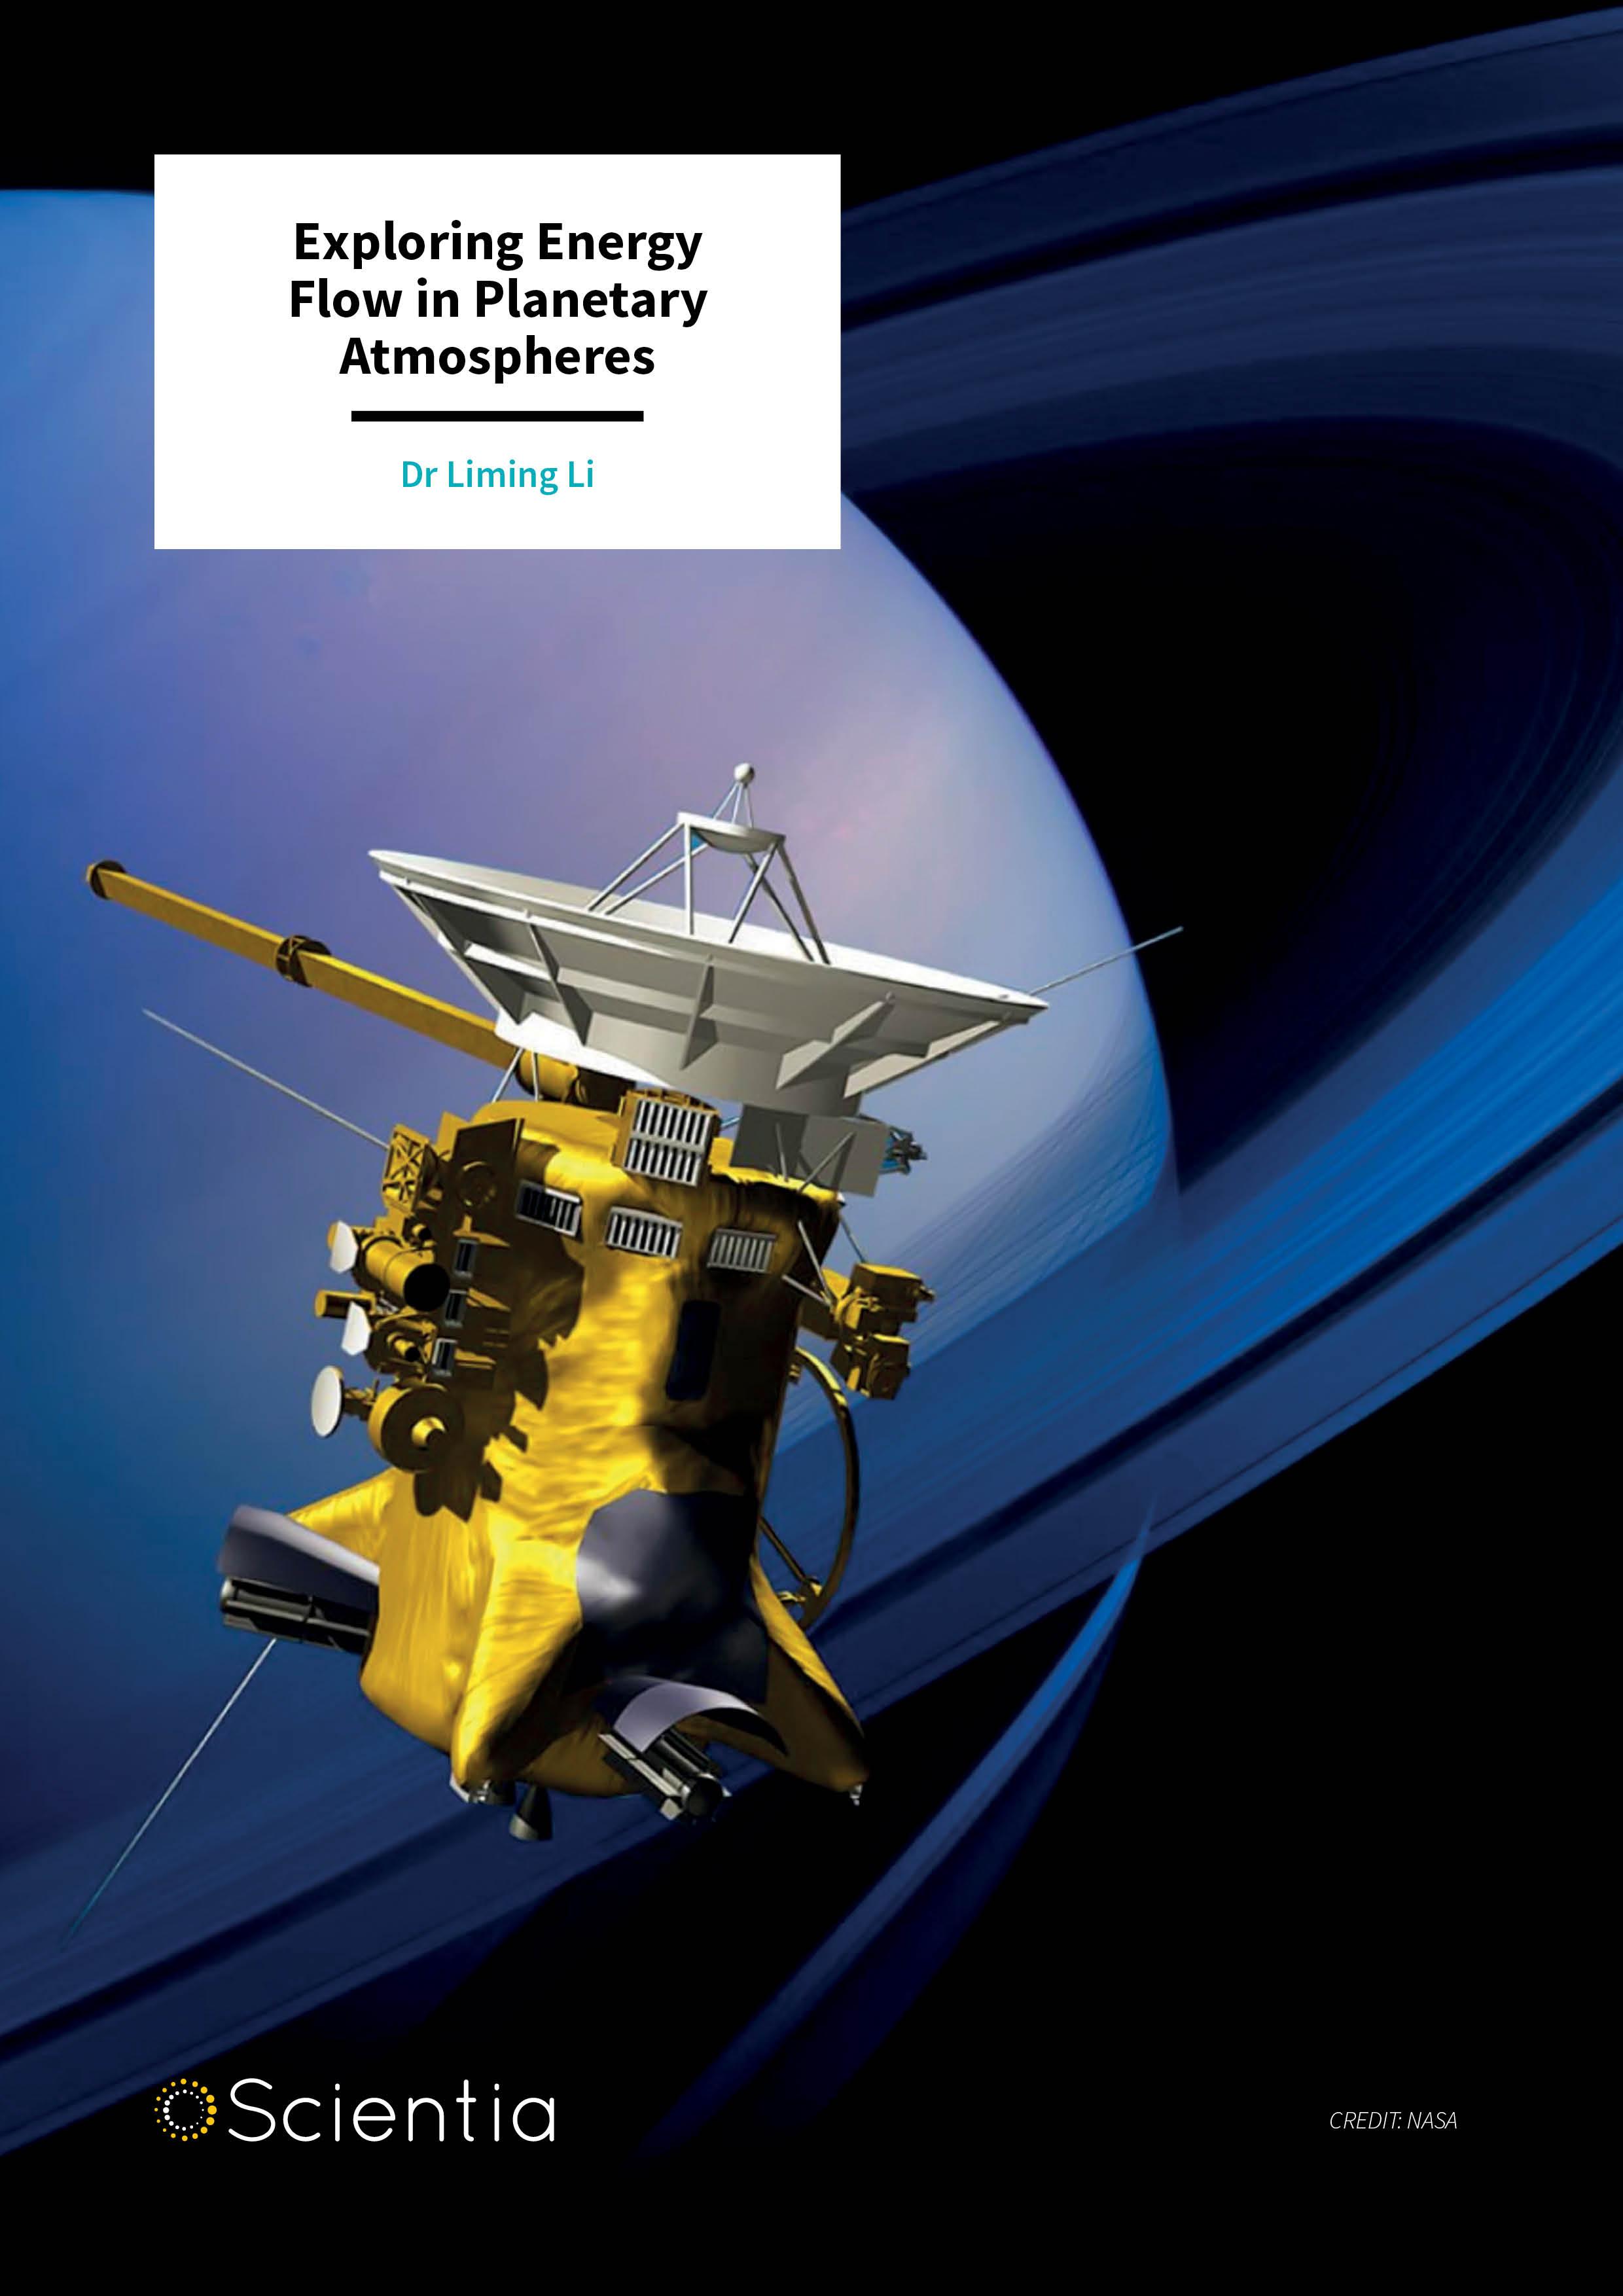 Dr Liming Li – Exploring Energy Flow in Planetary Atmospheres